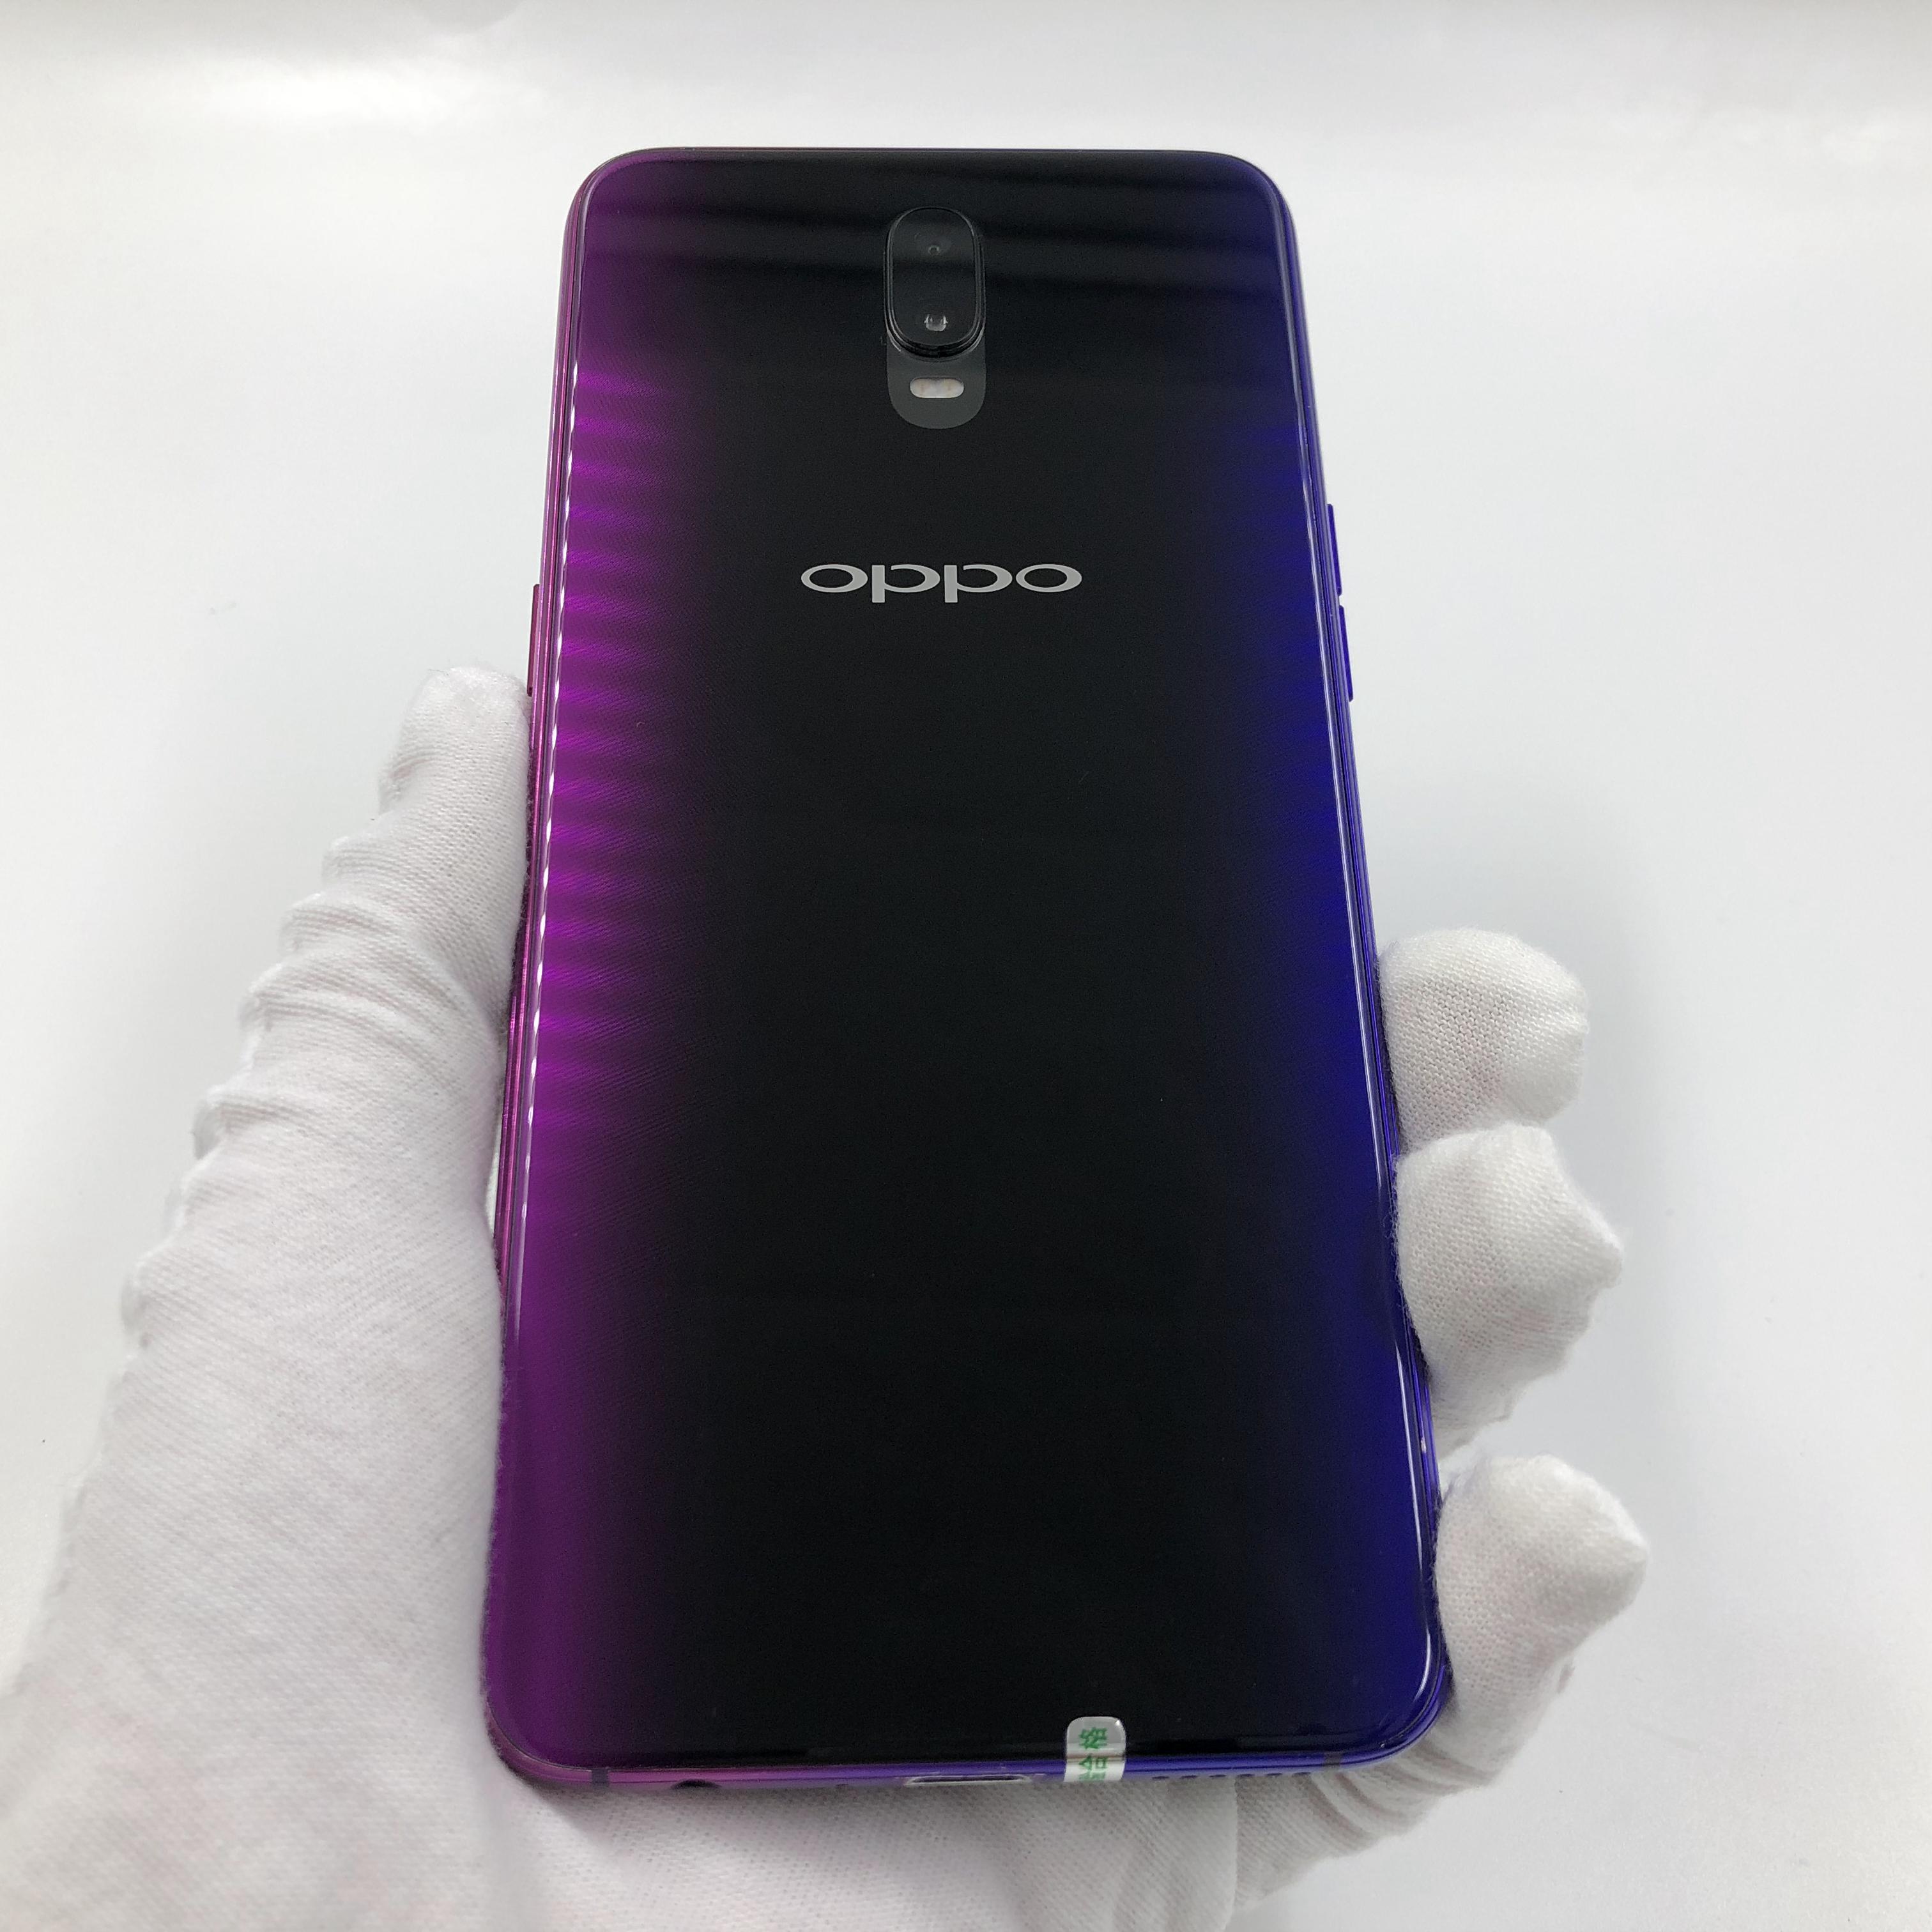 oppo【R17】4G全网通 紫色 8G/128G 国行 9成新 真机实拍